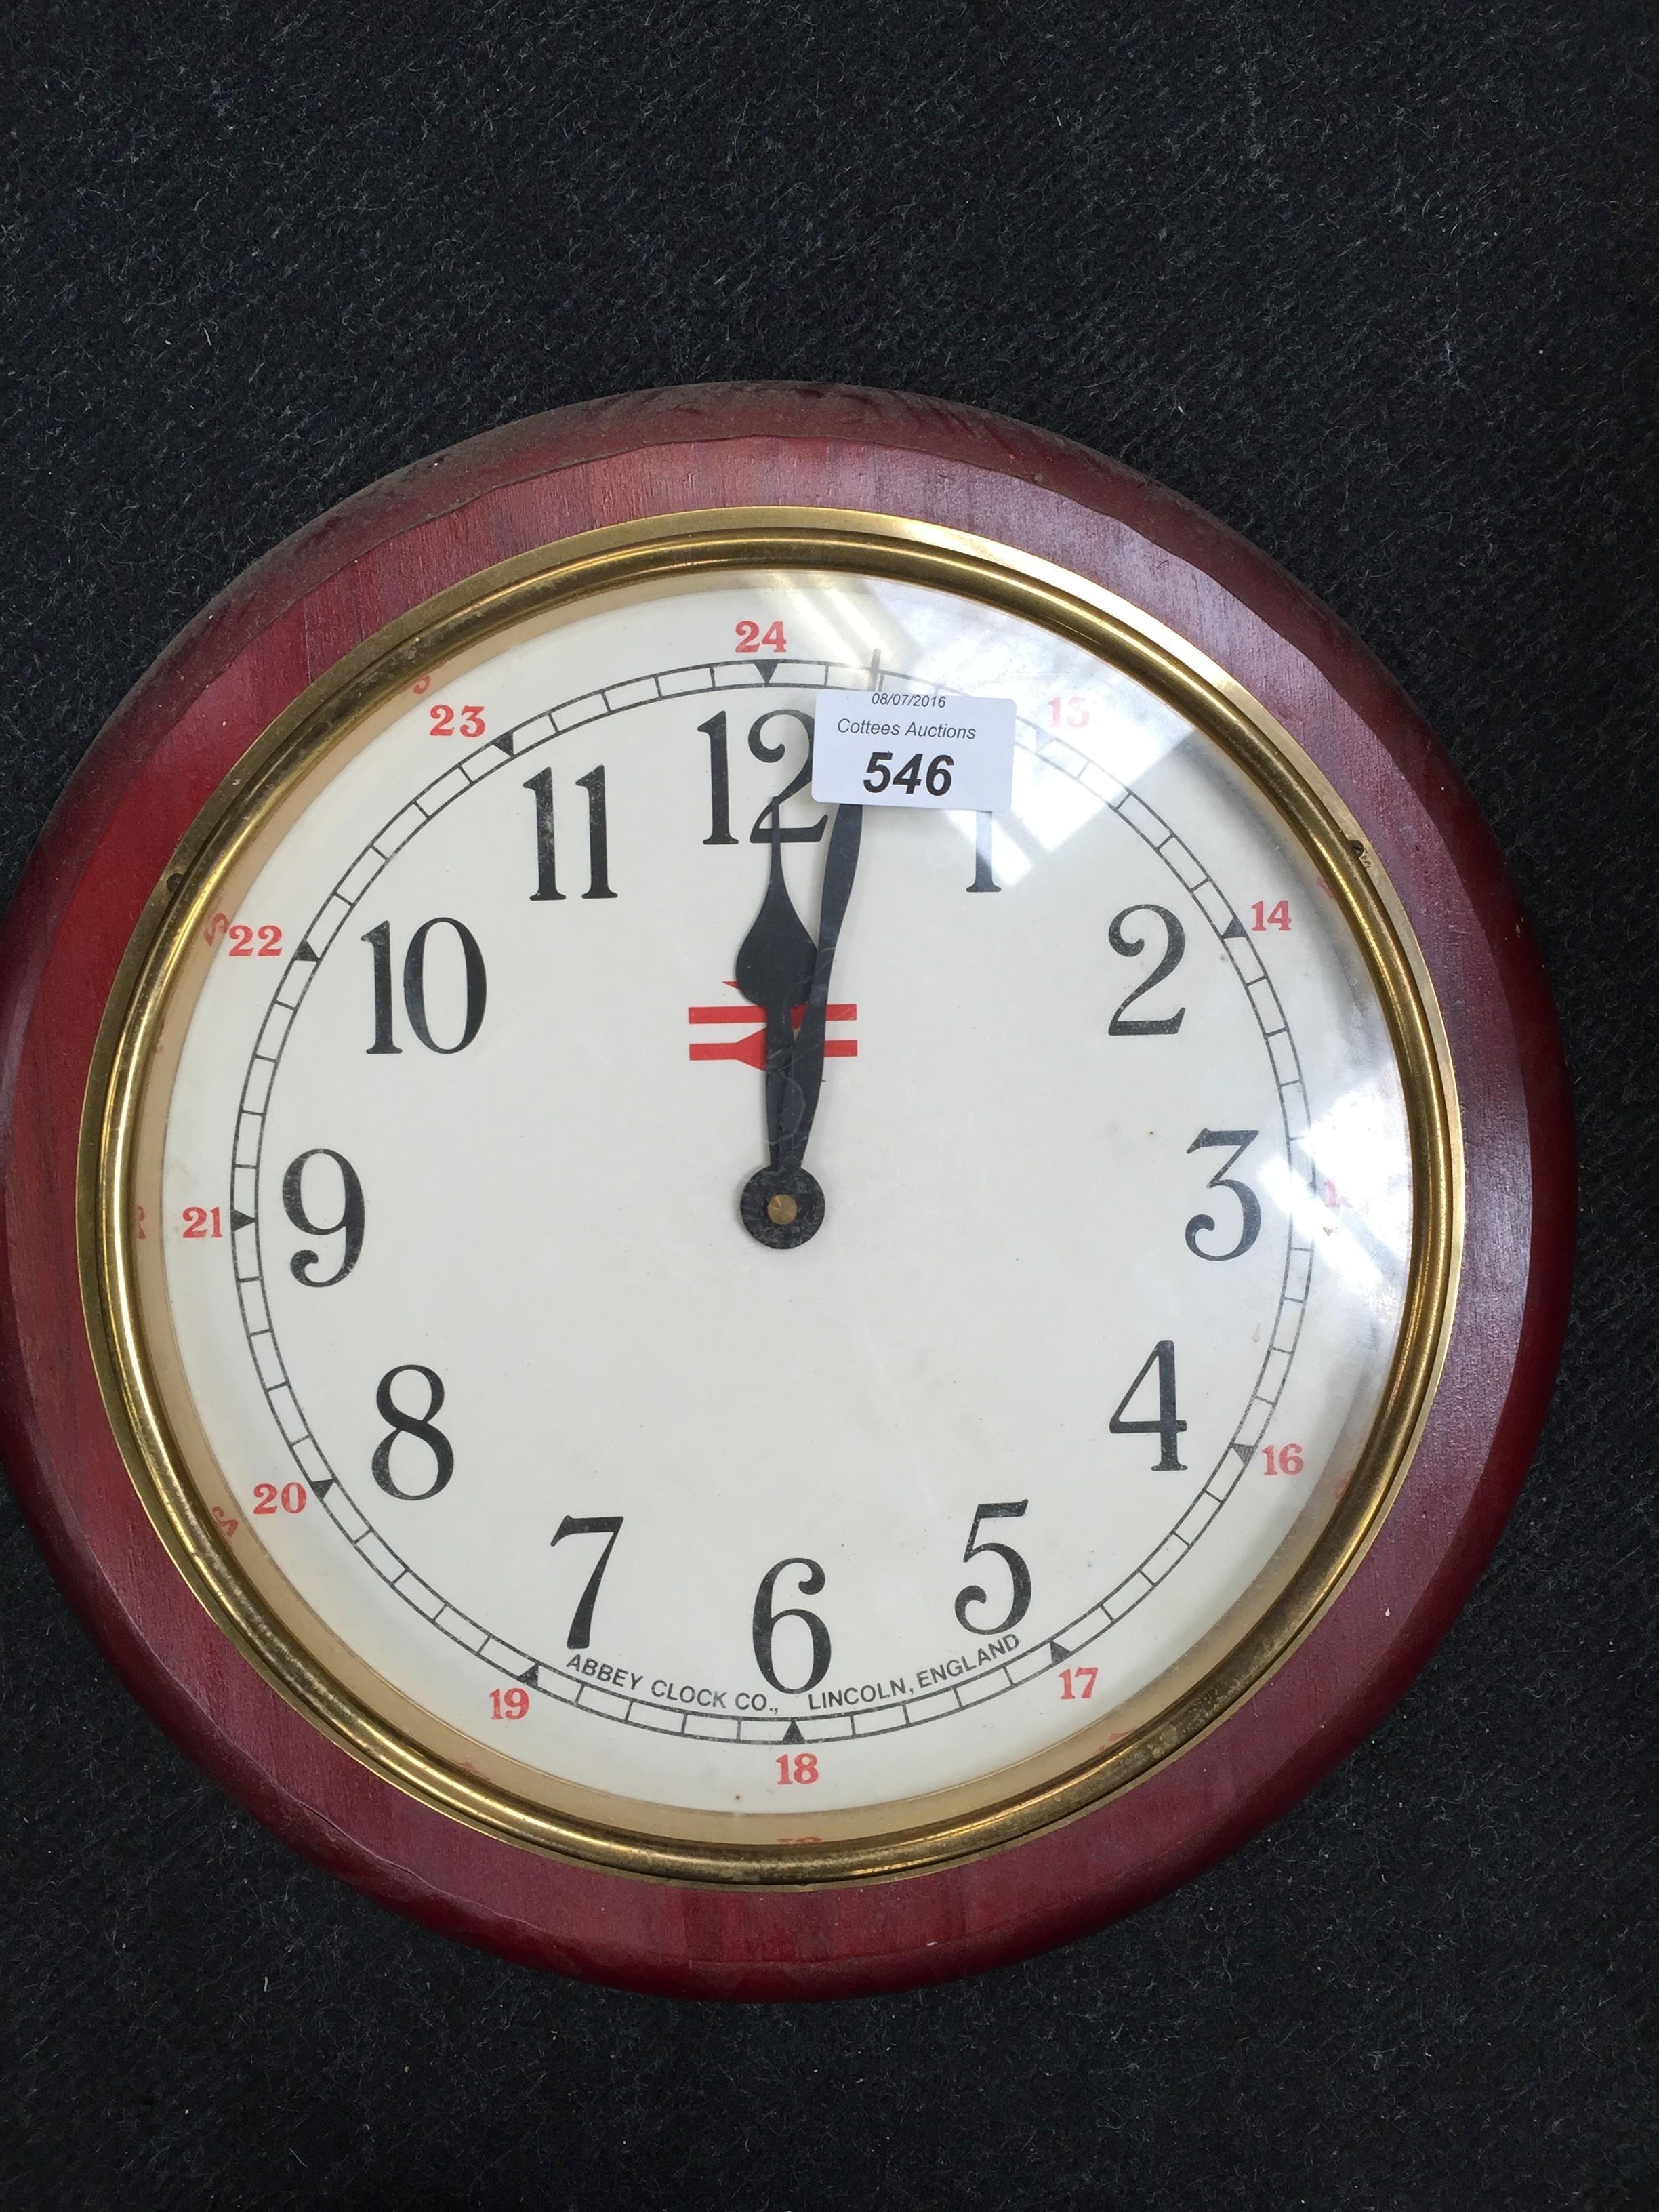 A late original british railways 13 in diameter battery operated lot 546 a late original british railways 13 in diameter battery operated clock made by amipublicfo Gallery